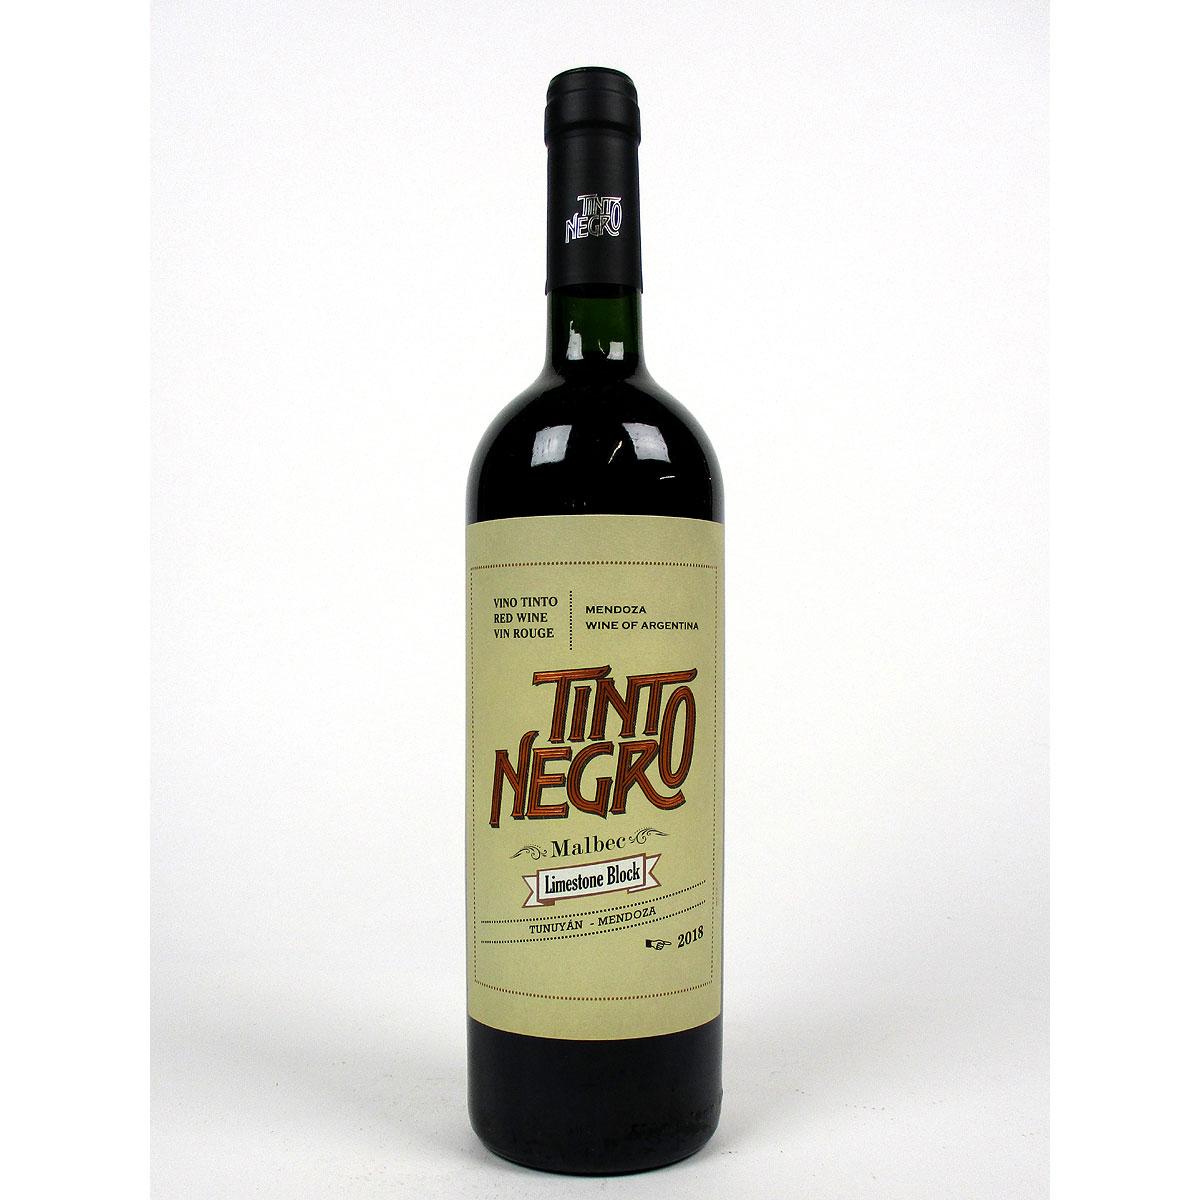 Tinto Negro: Uco Valley Malbec Cabernet Franc 'Limestone Block' 2018 - Bottle